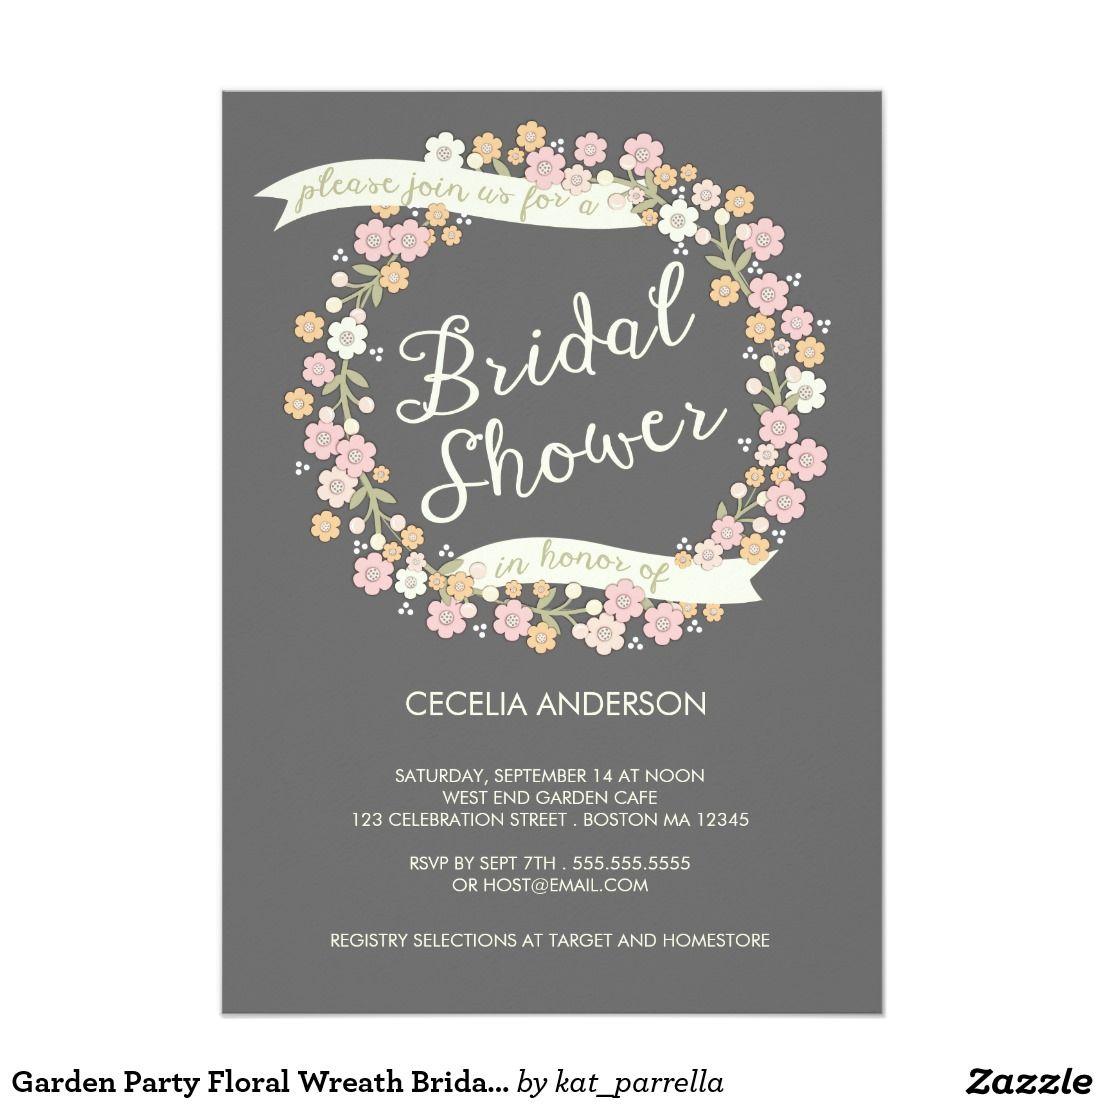 Garden party floral wreath bridal shower blush card floral wreath garden party floral wreath bridal shower blush 5 x 7 invitation card stopboris Choice Image